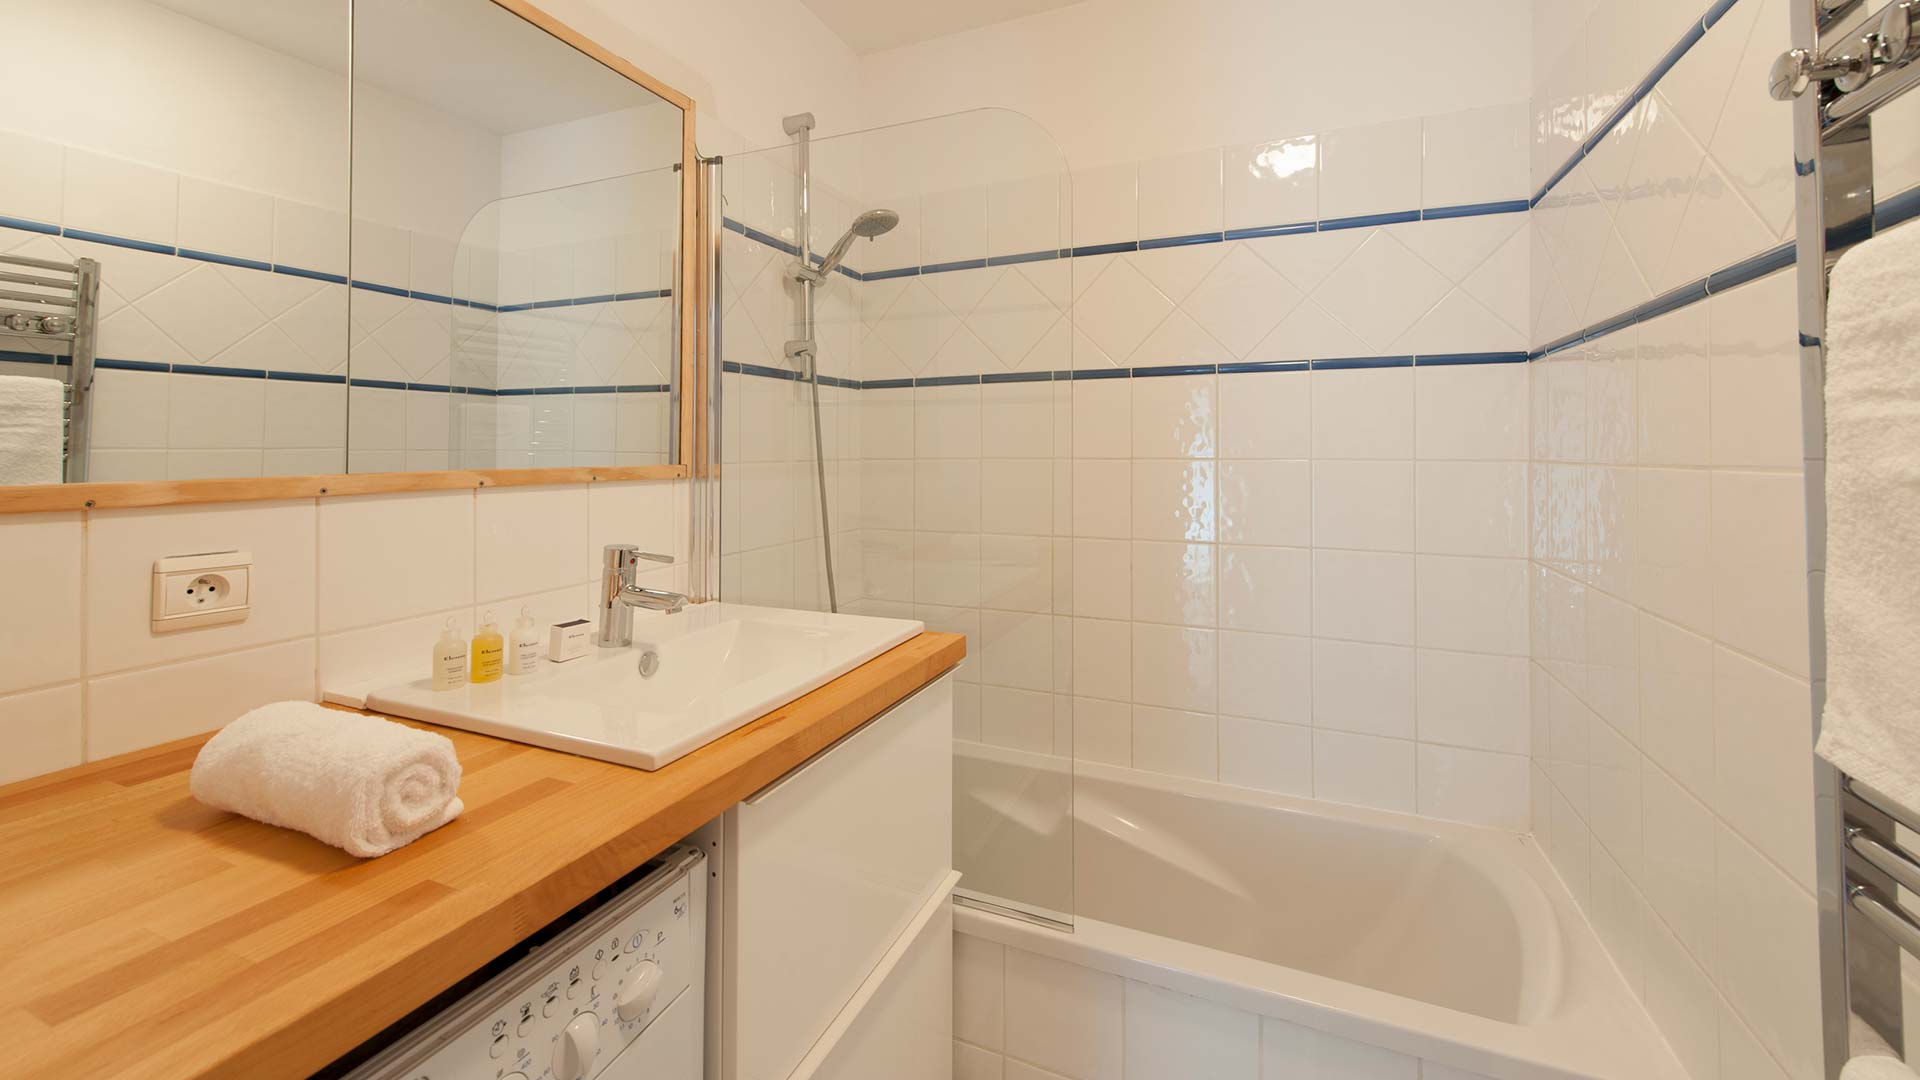 Premiere Neige Apartment Agneau bathroom, sleeps 4, self catering.